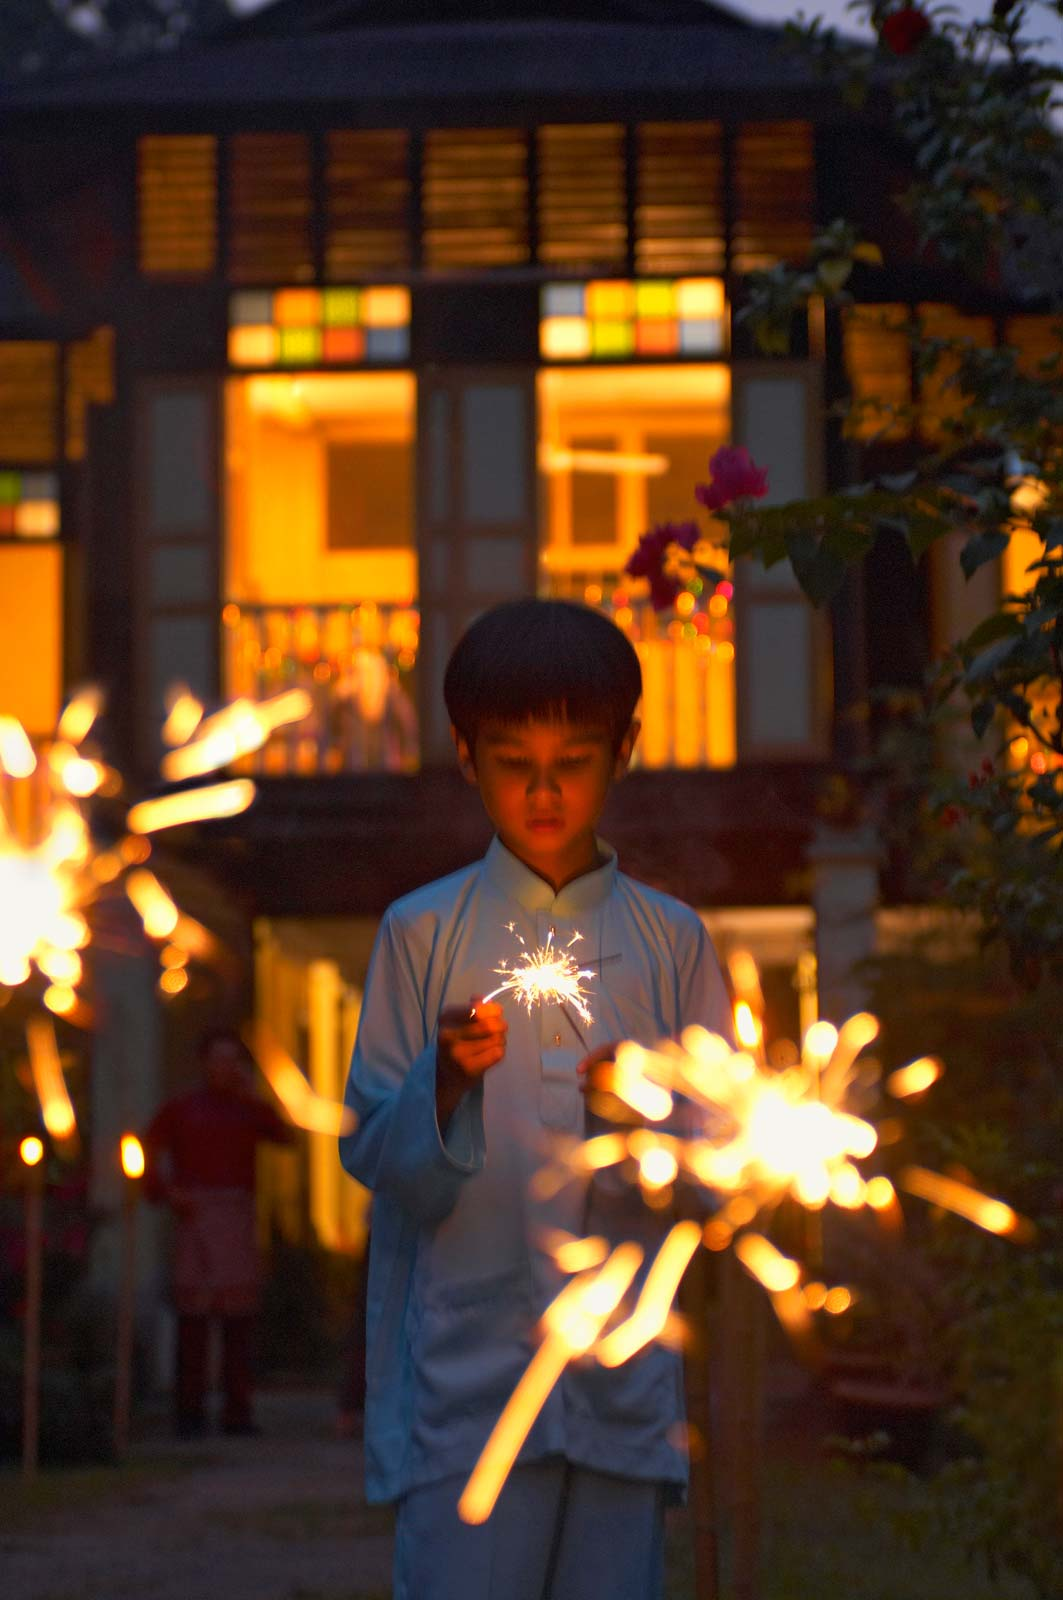 Ramadan | Fasting & Traditions